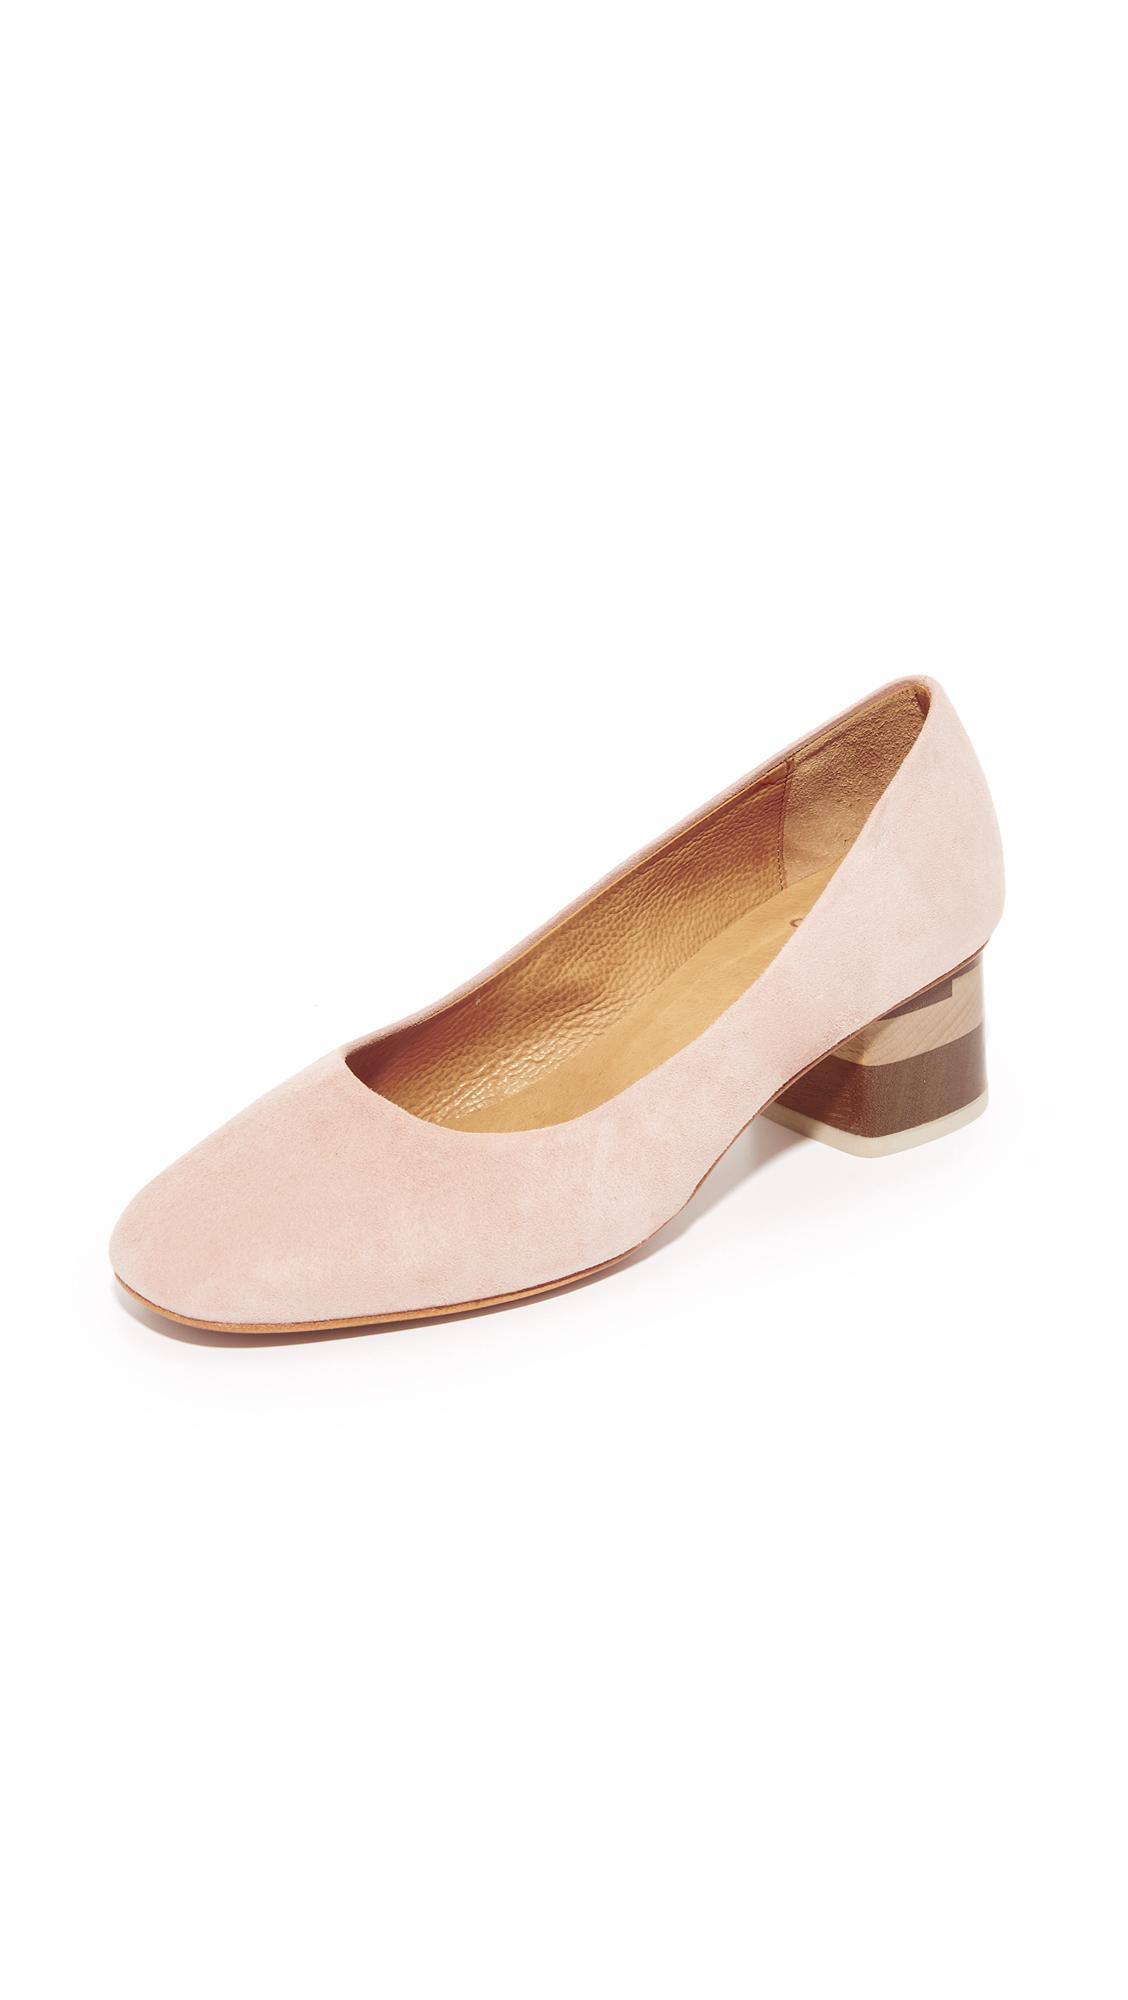 Coclico Shoes Epic Tricolor City Heels - Maquillaje/Tricolor at Shopbop